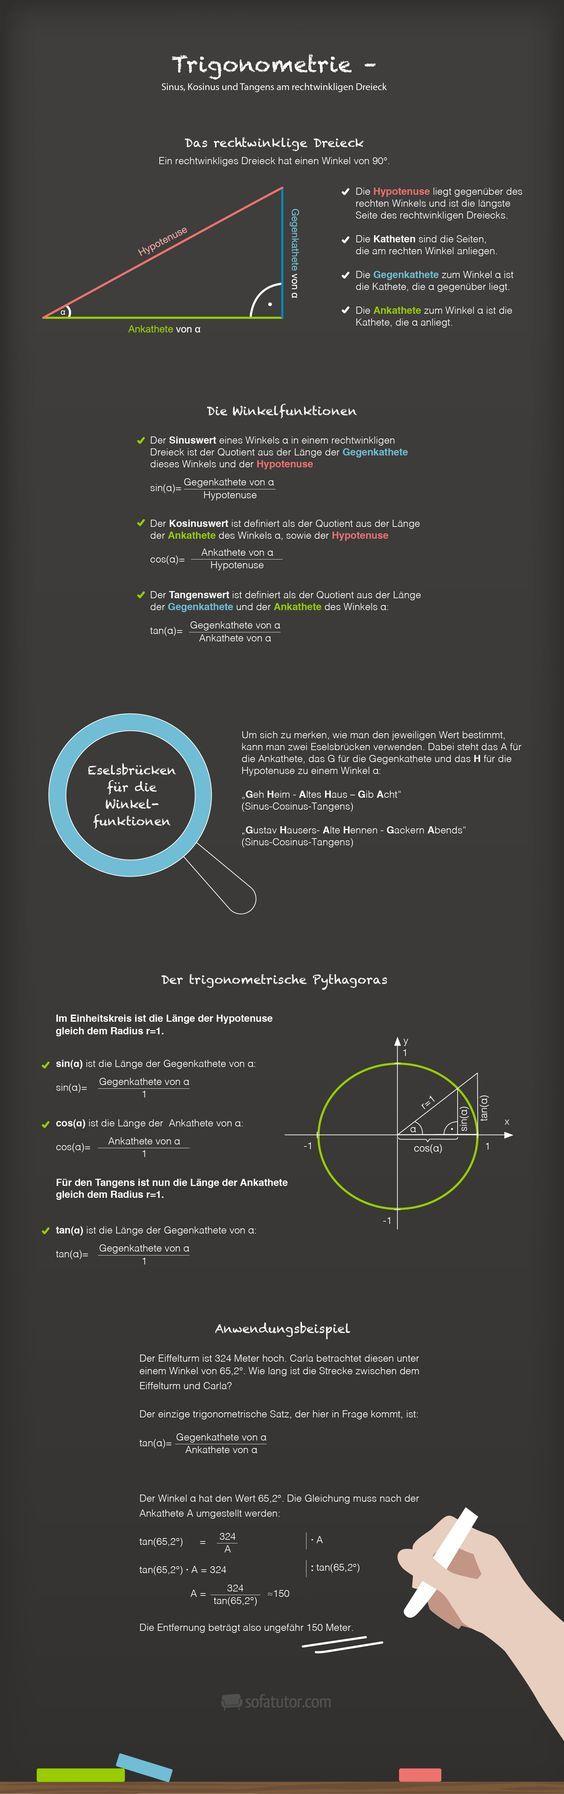 Fine Rechtwinkliges Dreieck Trigonometrie Arbeitsblatt Images ...